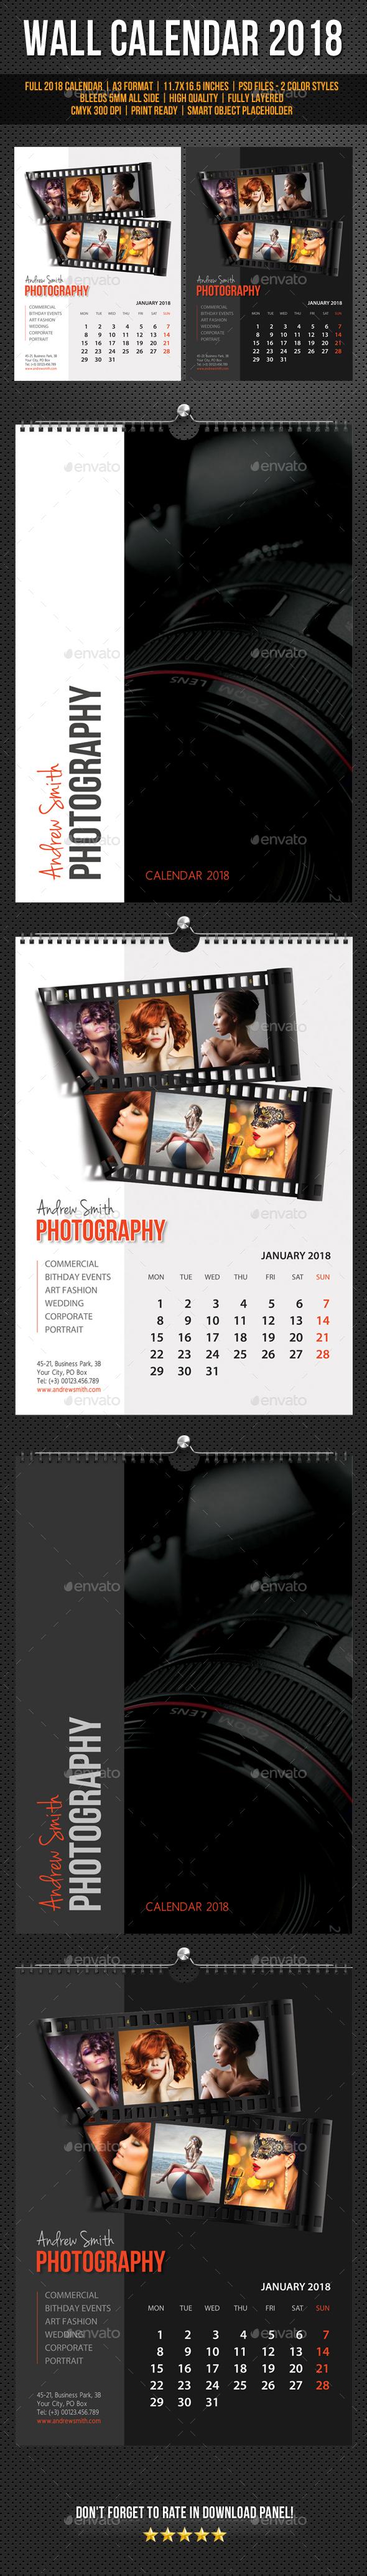 Wall Calendar A3 2018 v18 - Calendars Stationery